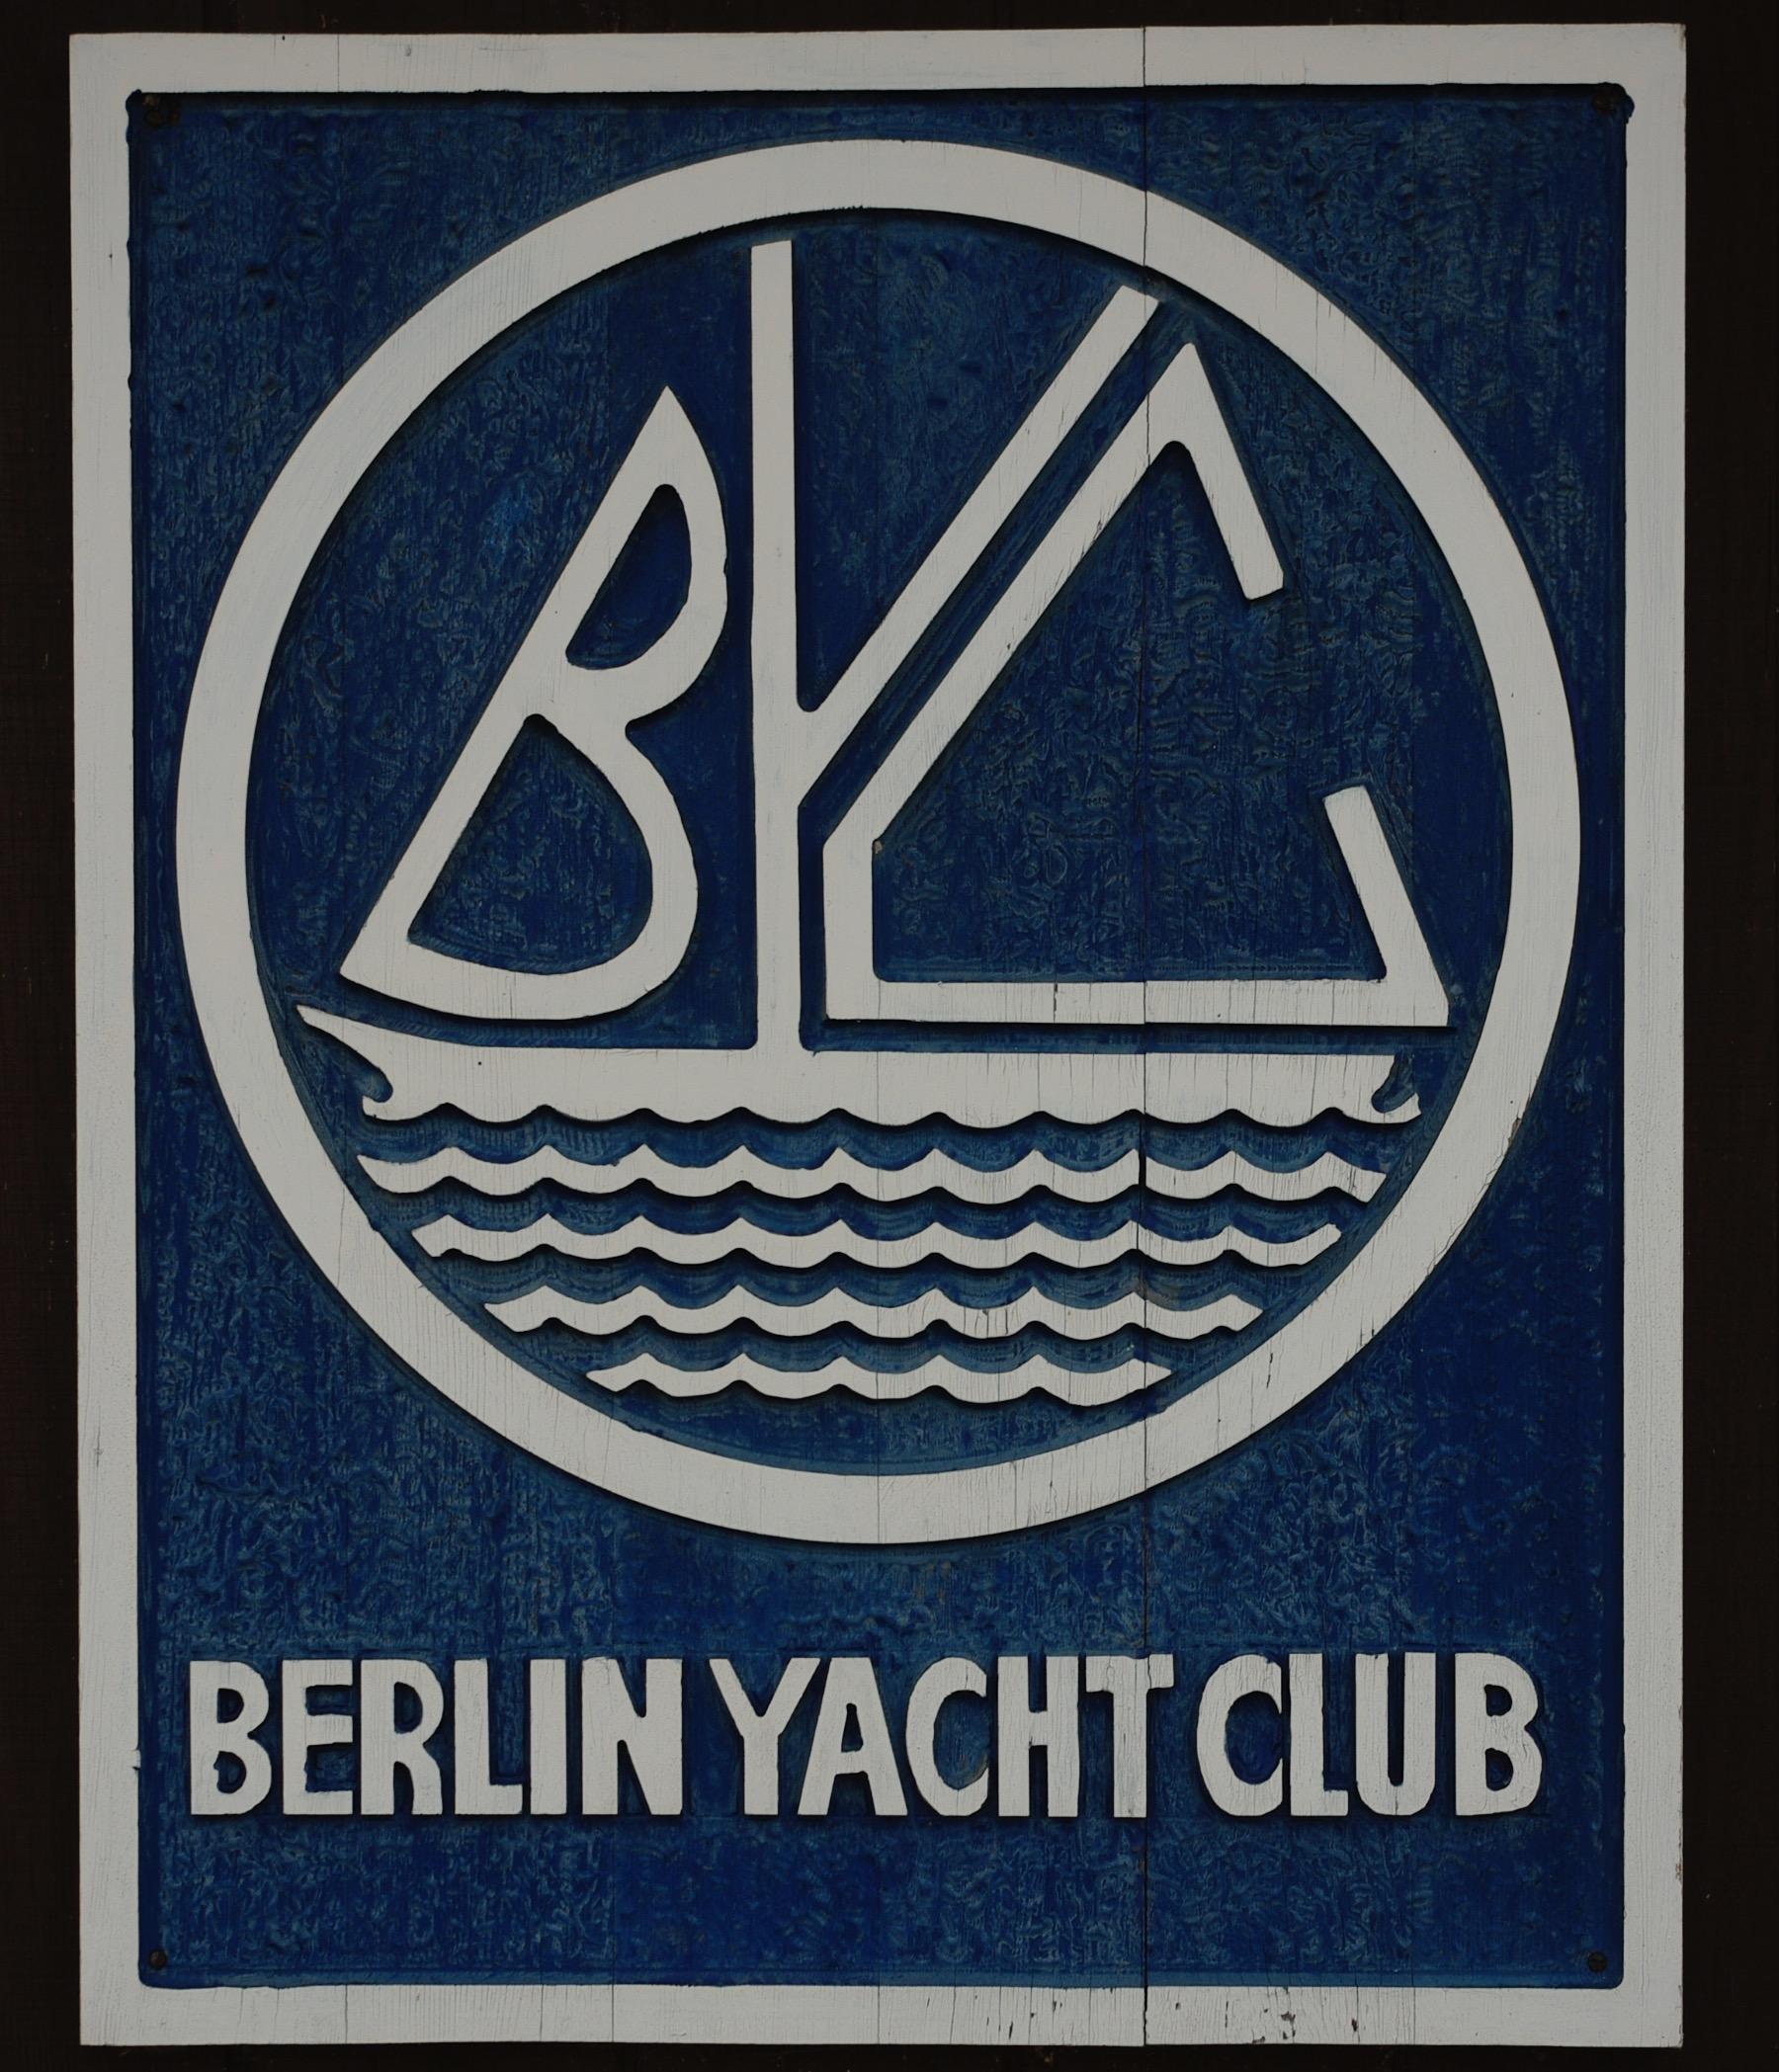 Berlin Yacht Club